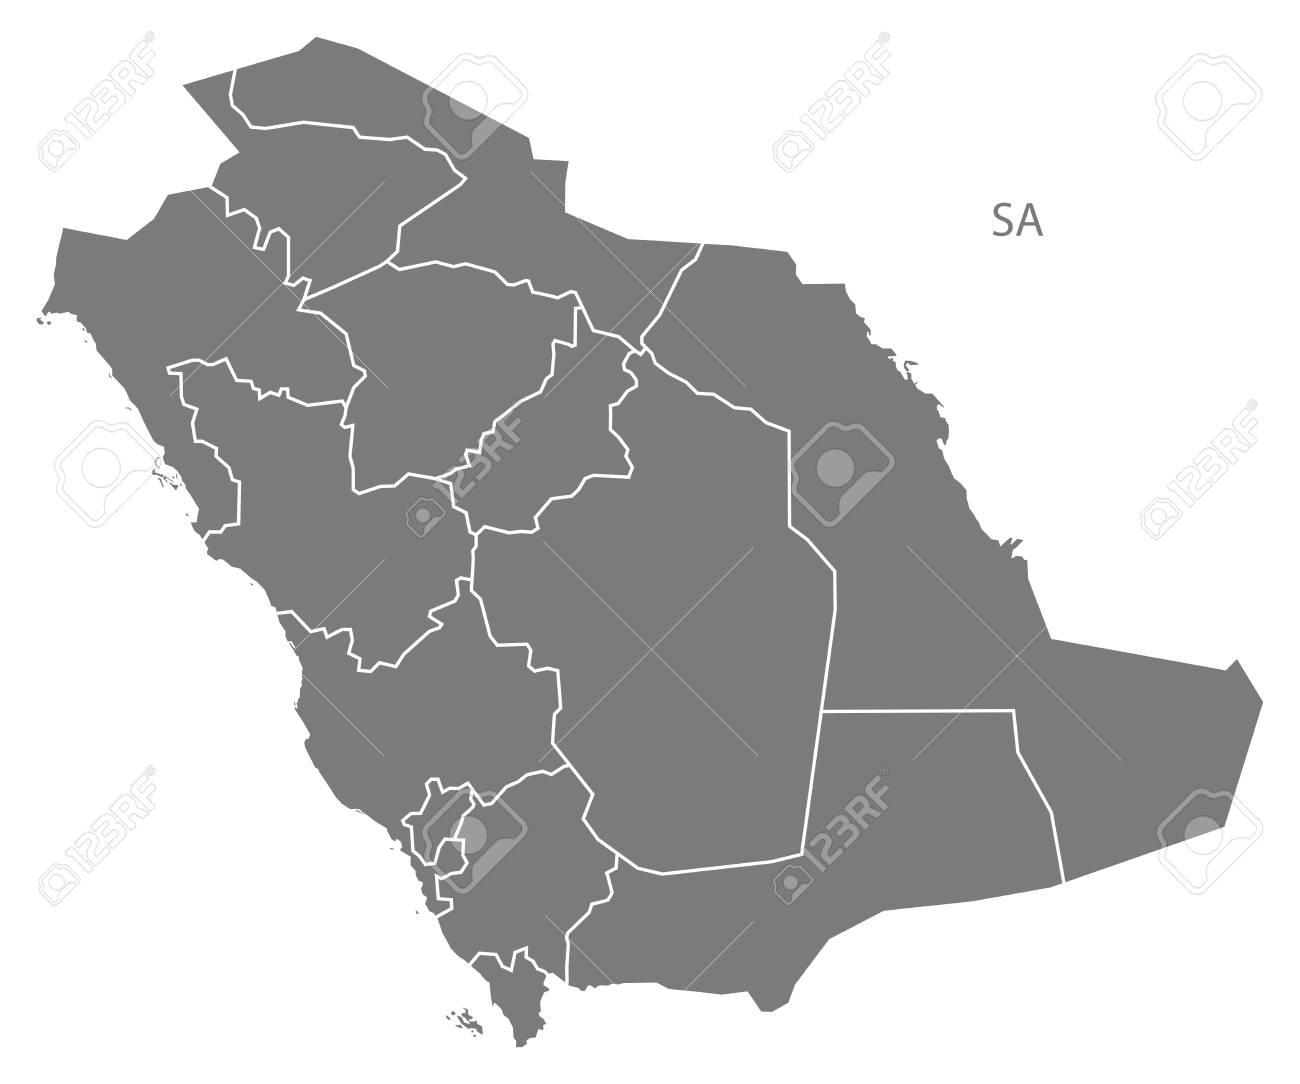 Saudi Arabia Map In Gray Royalty Free Cliparts, Vectors, And Stock ...